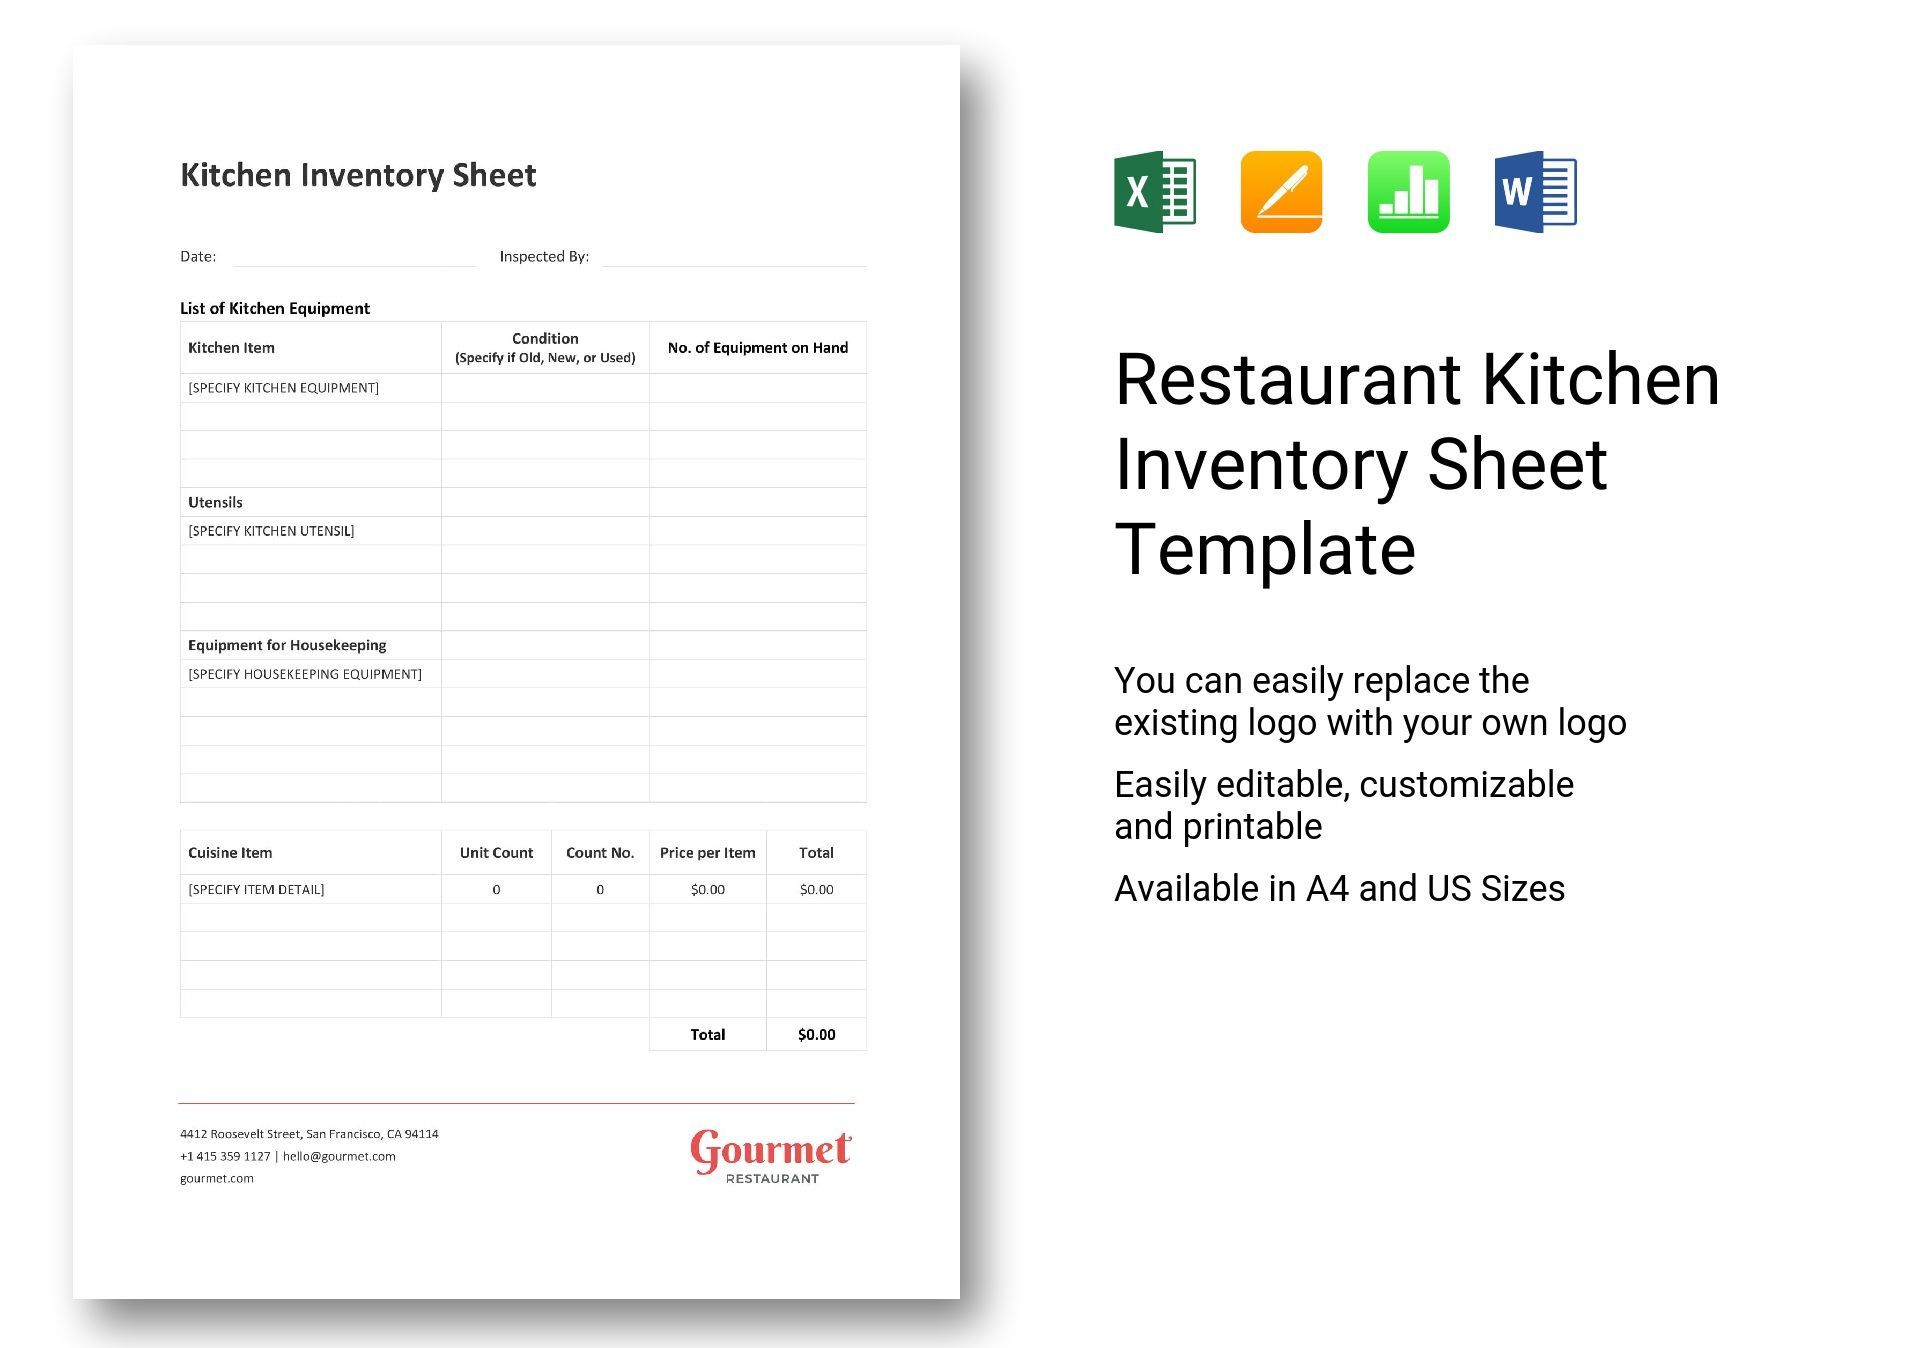 Restaurant Kitchen Inventory Sheet Template In Word Excel